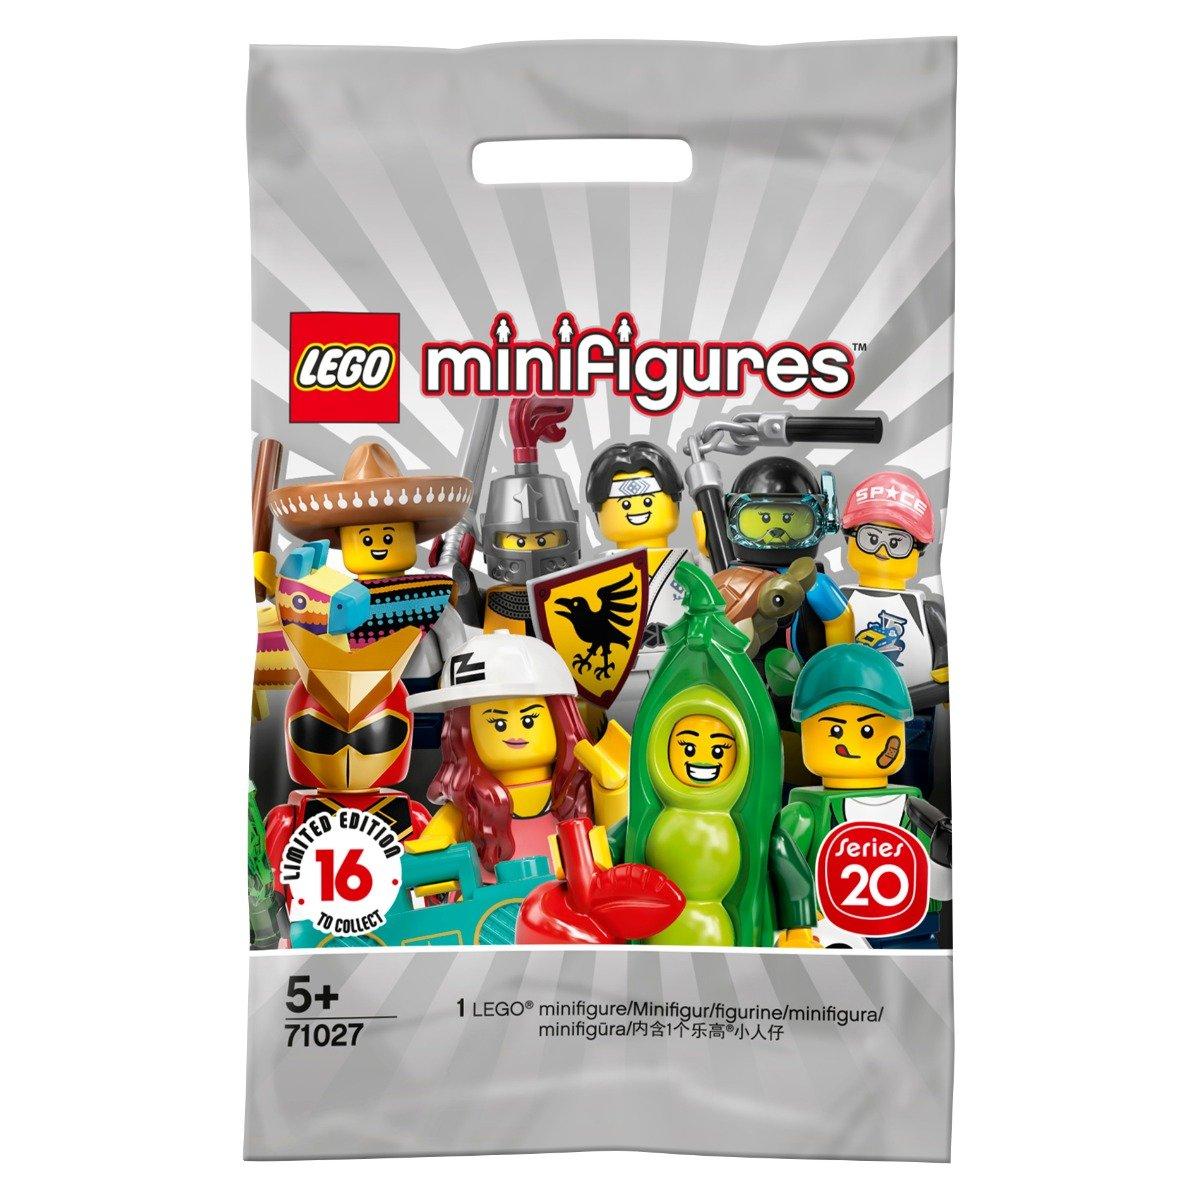 Figurina surpriza LEGO® Minifigures - Seria 20 (71027)